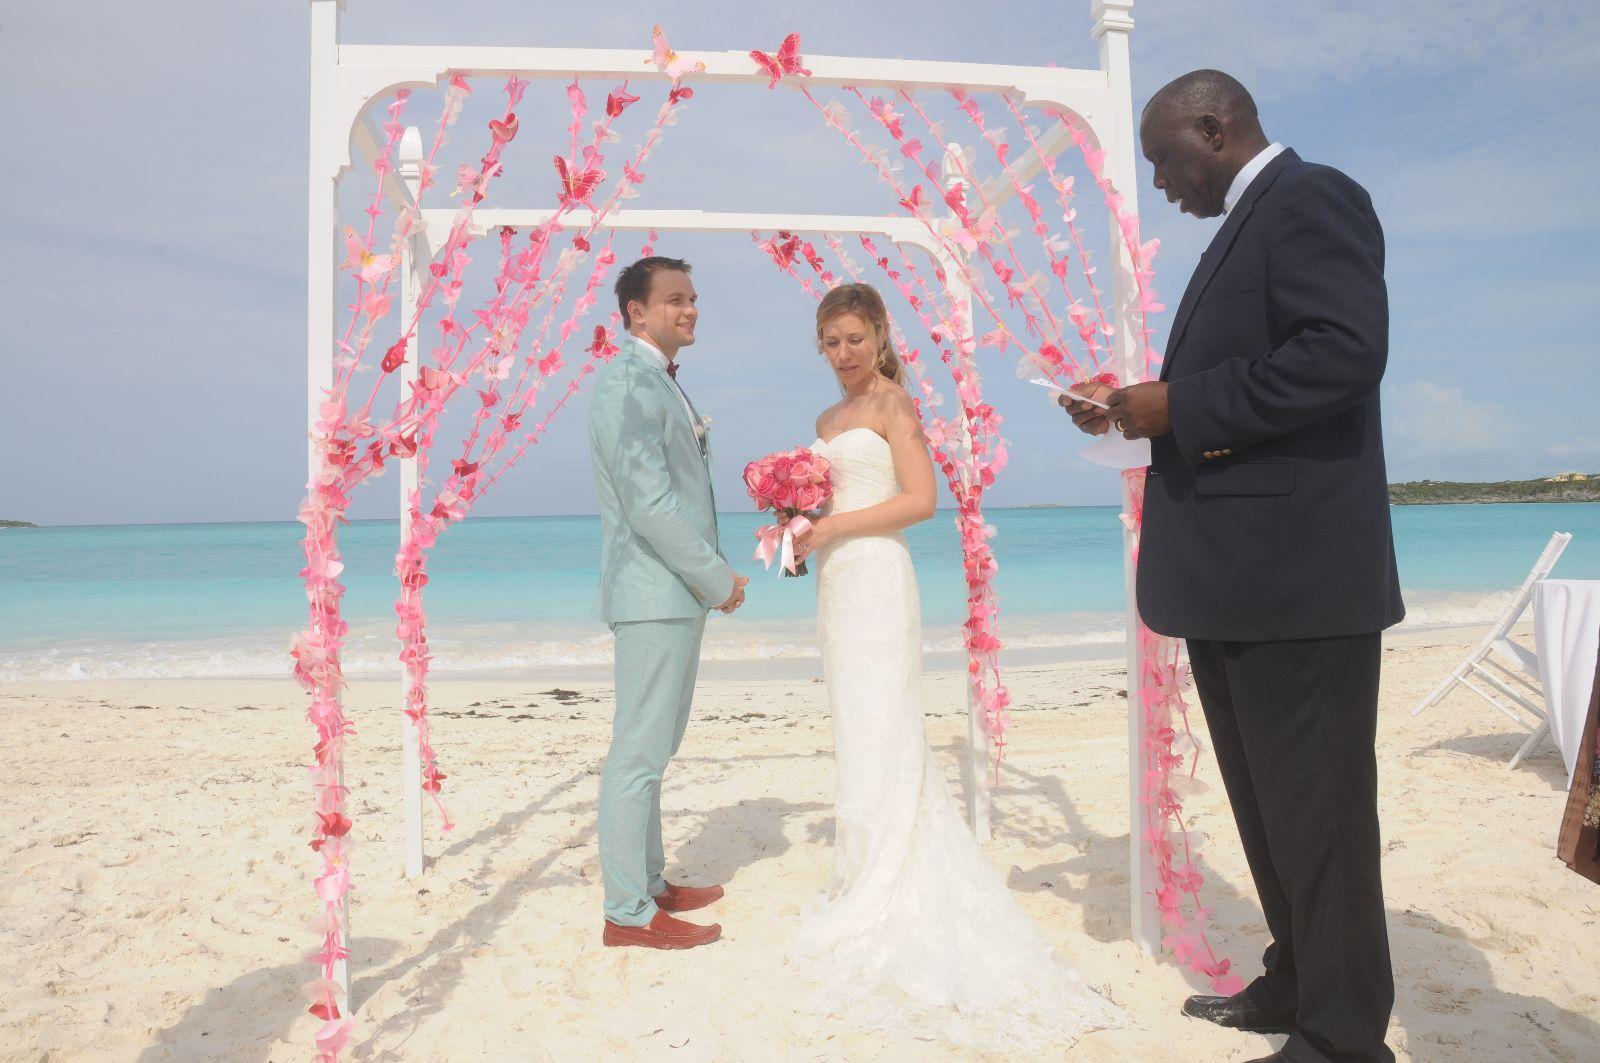 real weddings grazina ruslanas tie the knot 16 ways wedding sandals G and R wedding